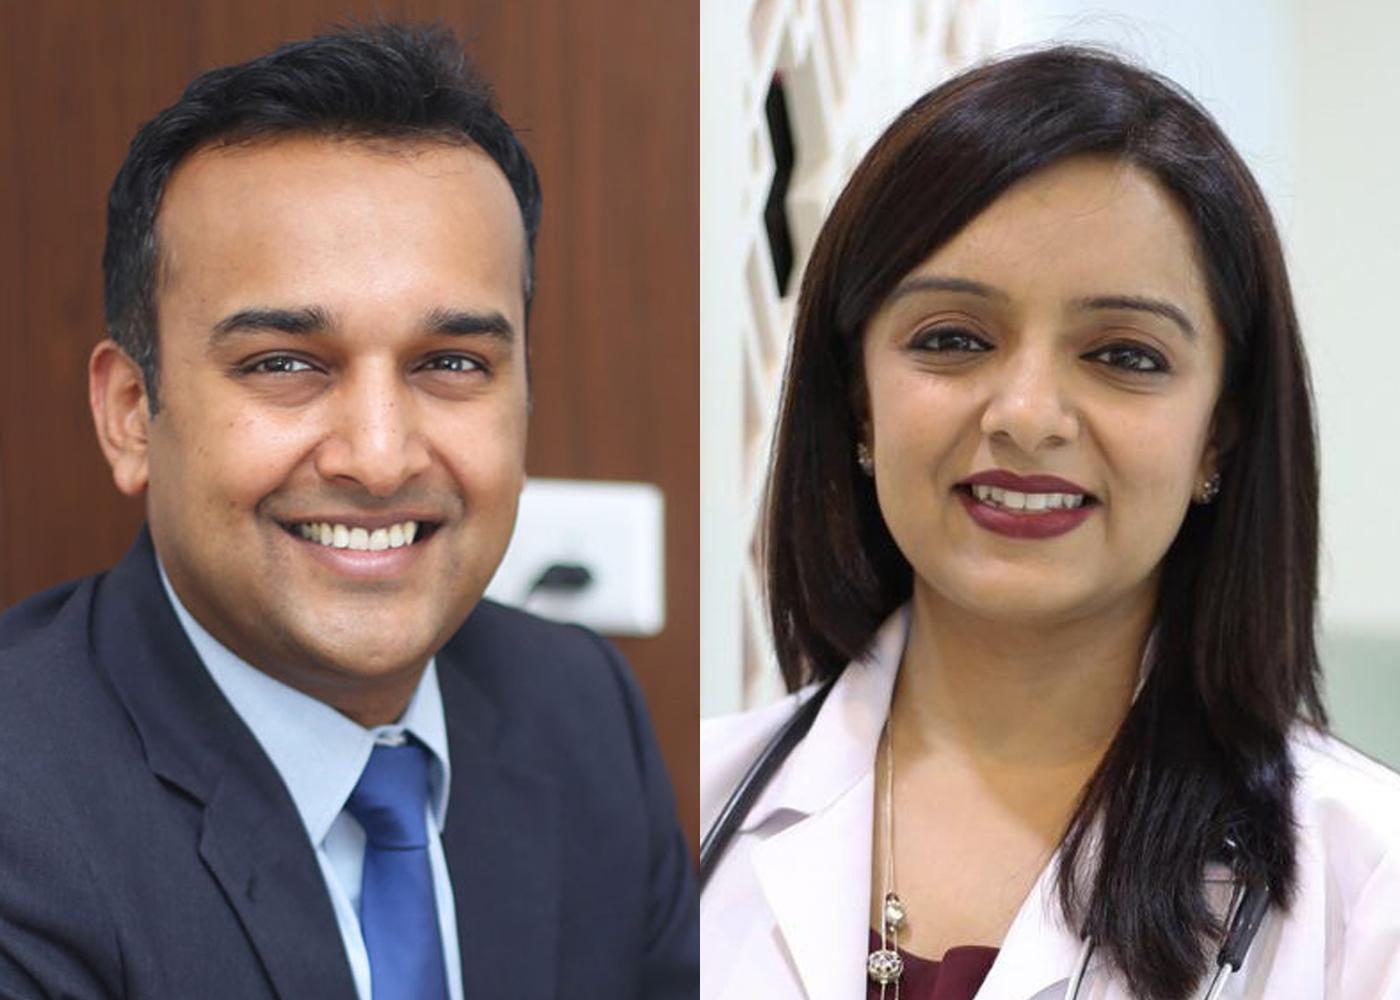 Dr. Sameer Gupta & Dr. Sonia Lal Gupta